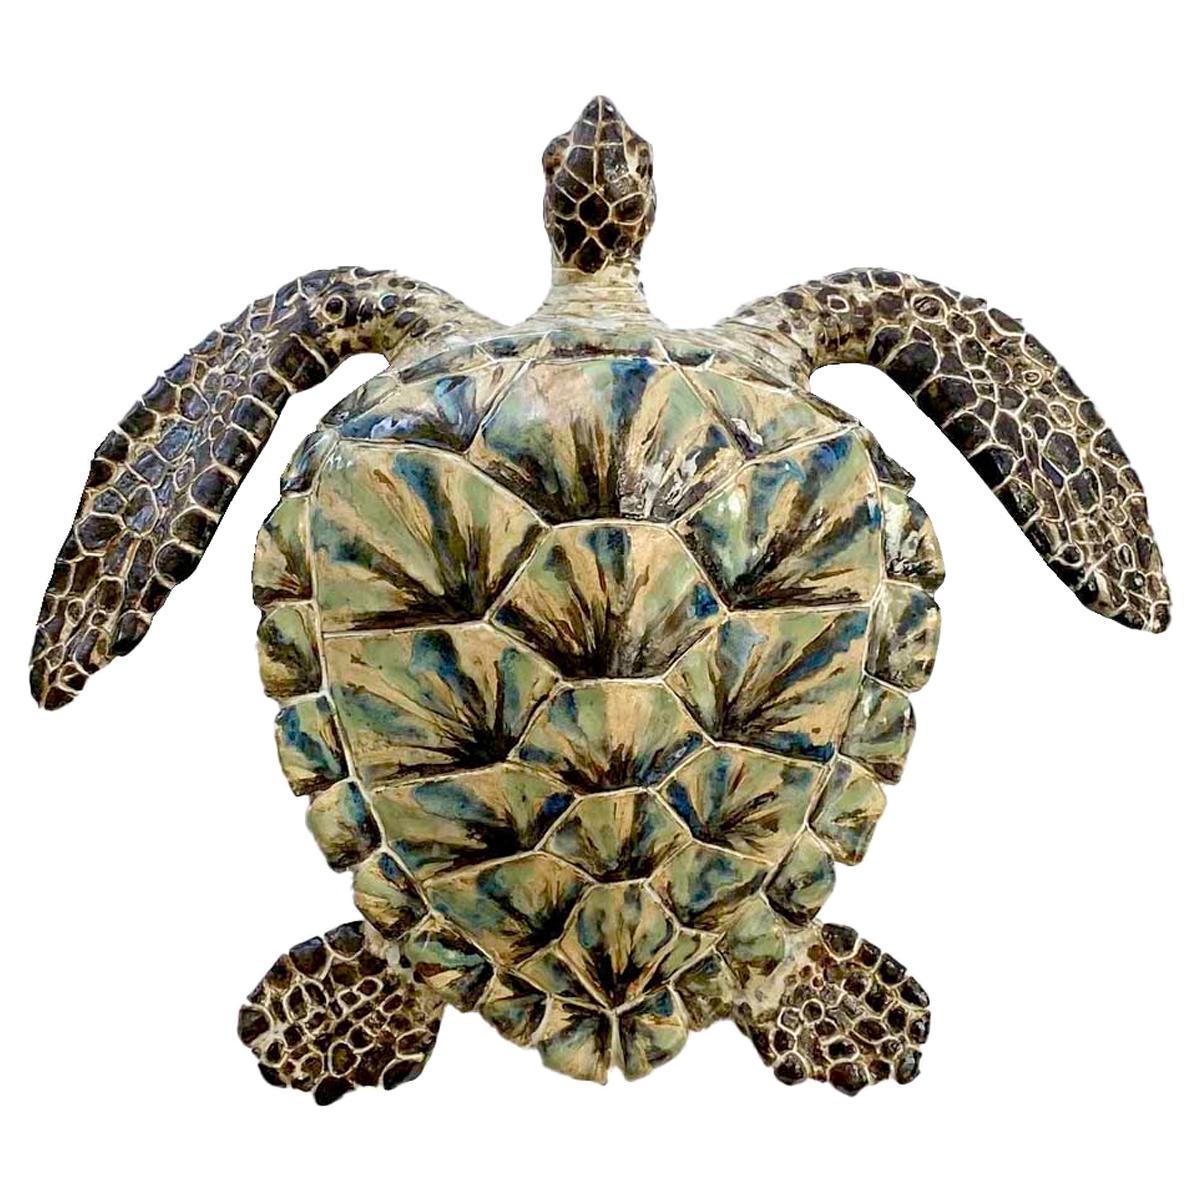 Large Glazed Ceramic Turtle Sculpture